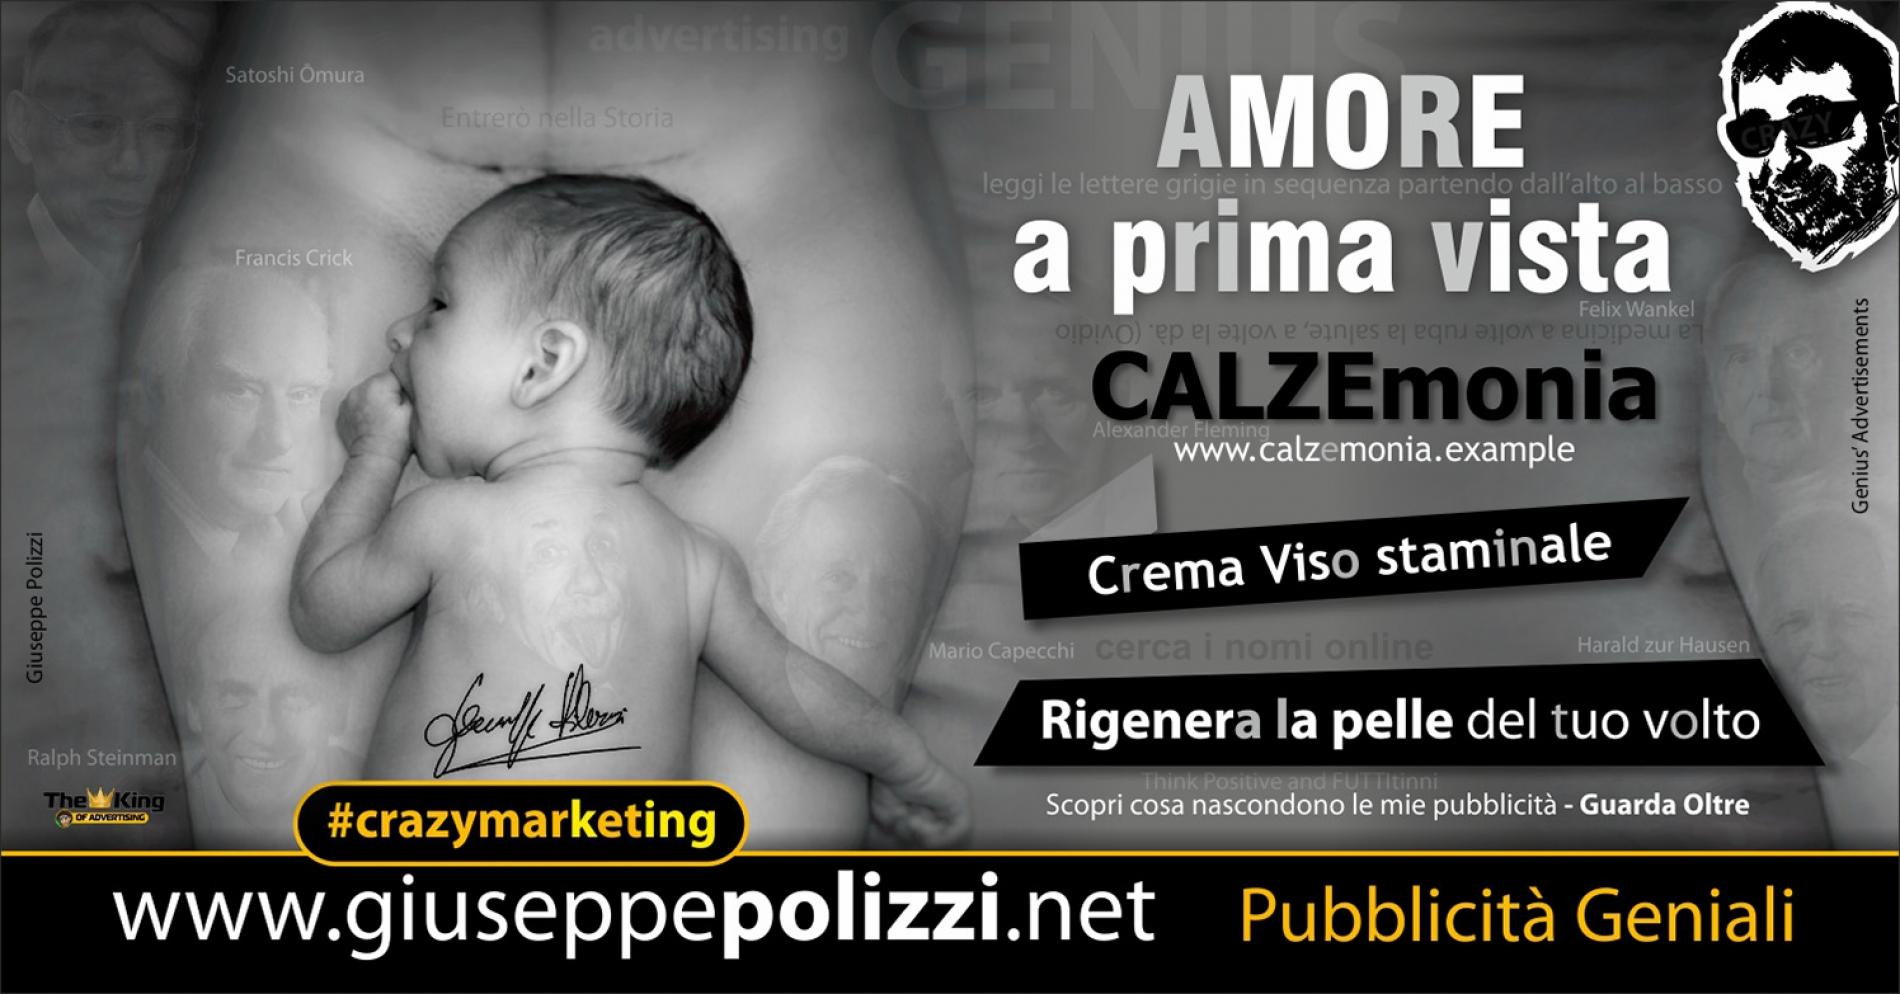 Giuseppe Polizzi crazymarketing Amore a prima vista  pubblicità geniali